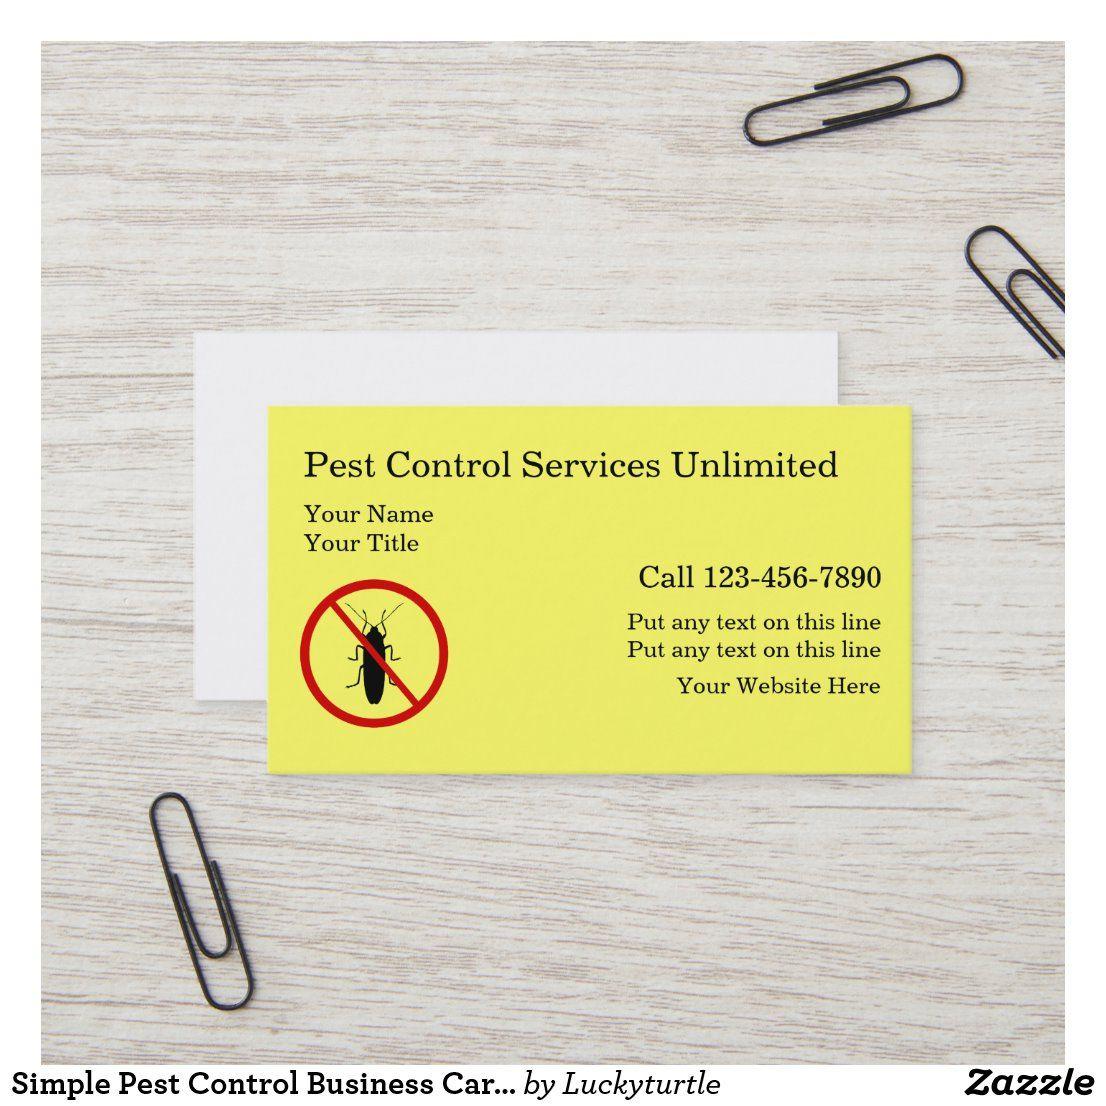 Simple Pest Control Business Cards Zazzle Com Pest Control Personal Business Cards Pests